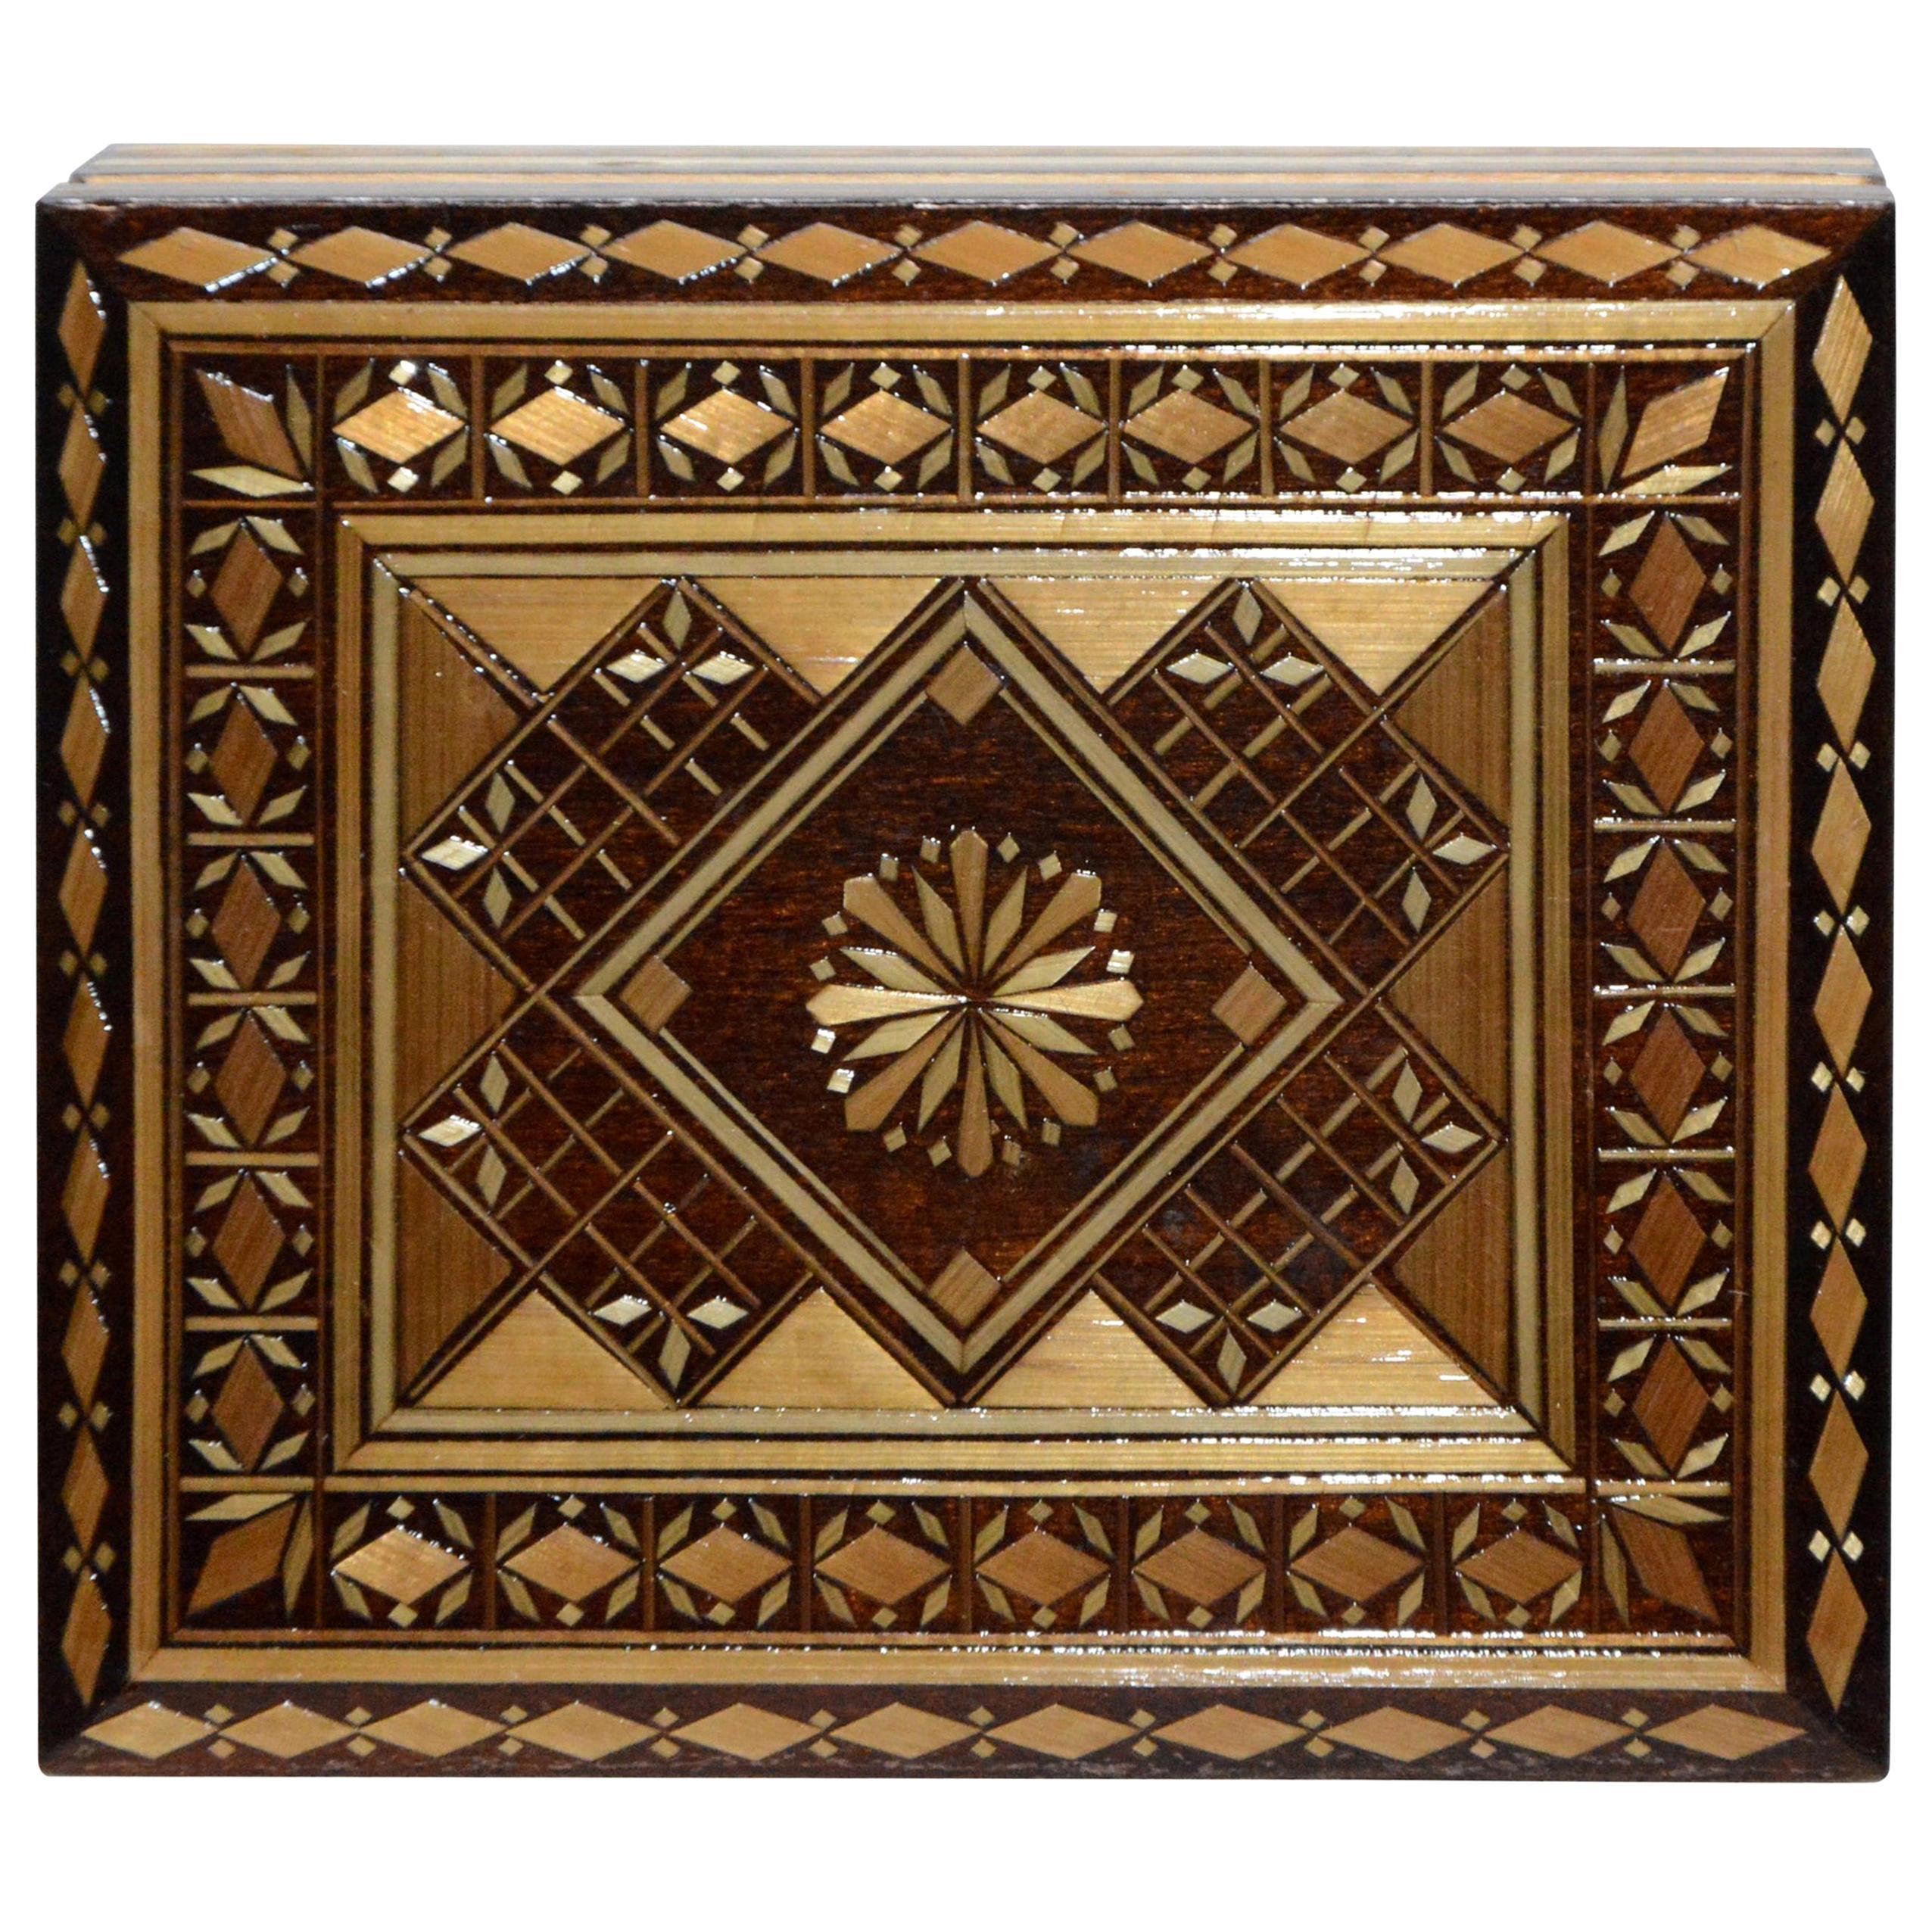 Russian Wooden Inlay Decorative Box